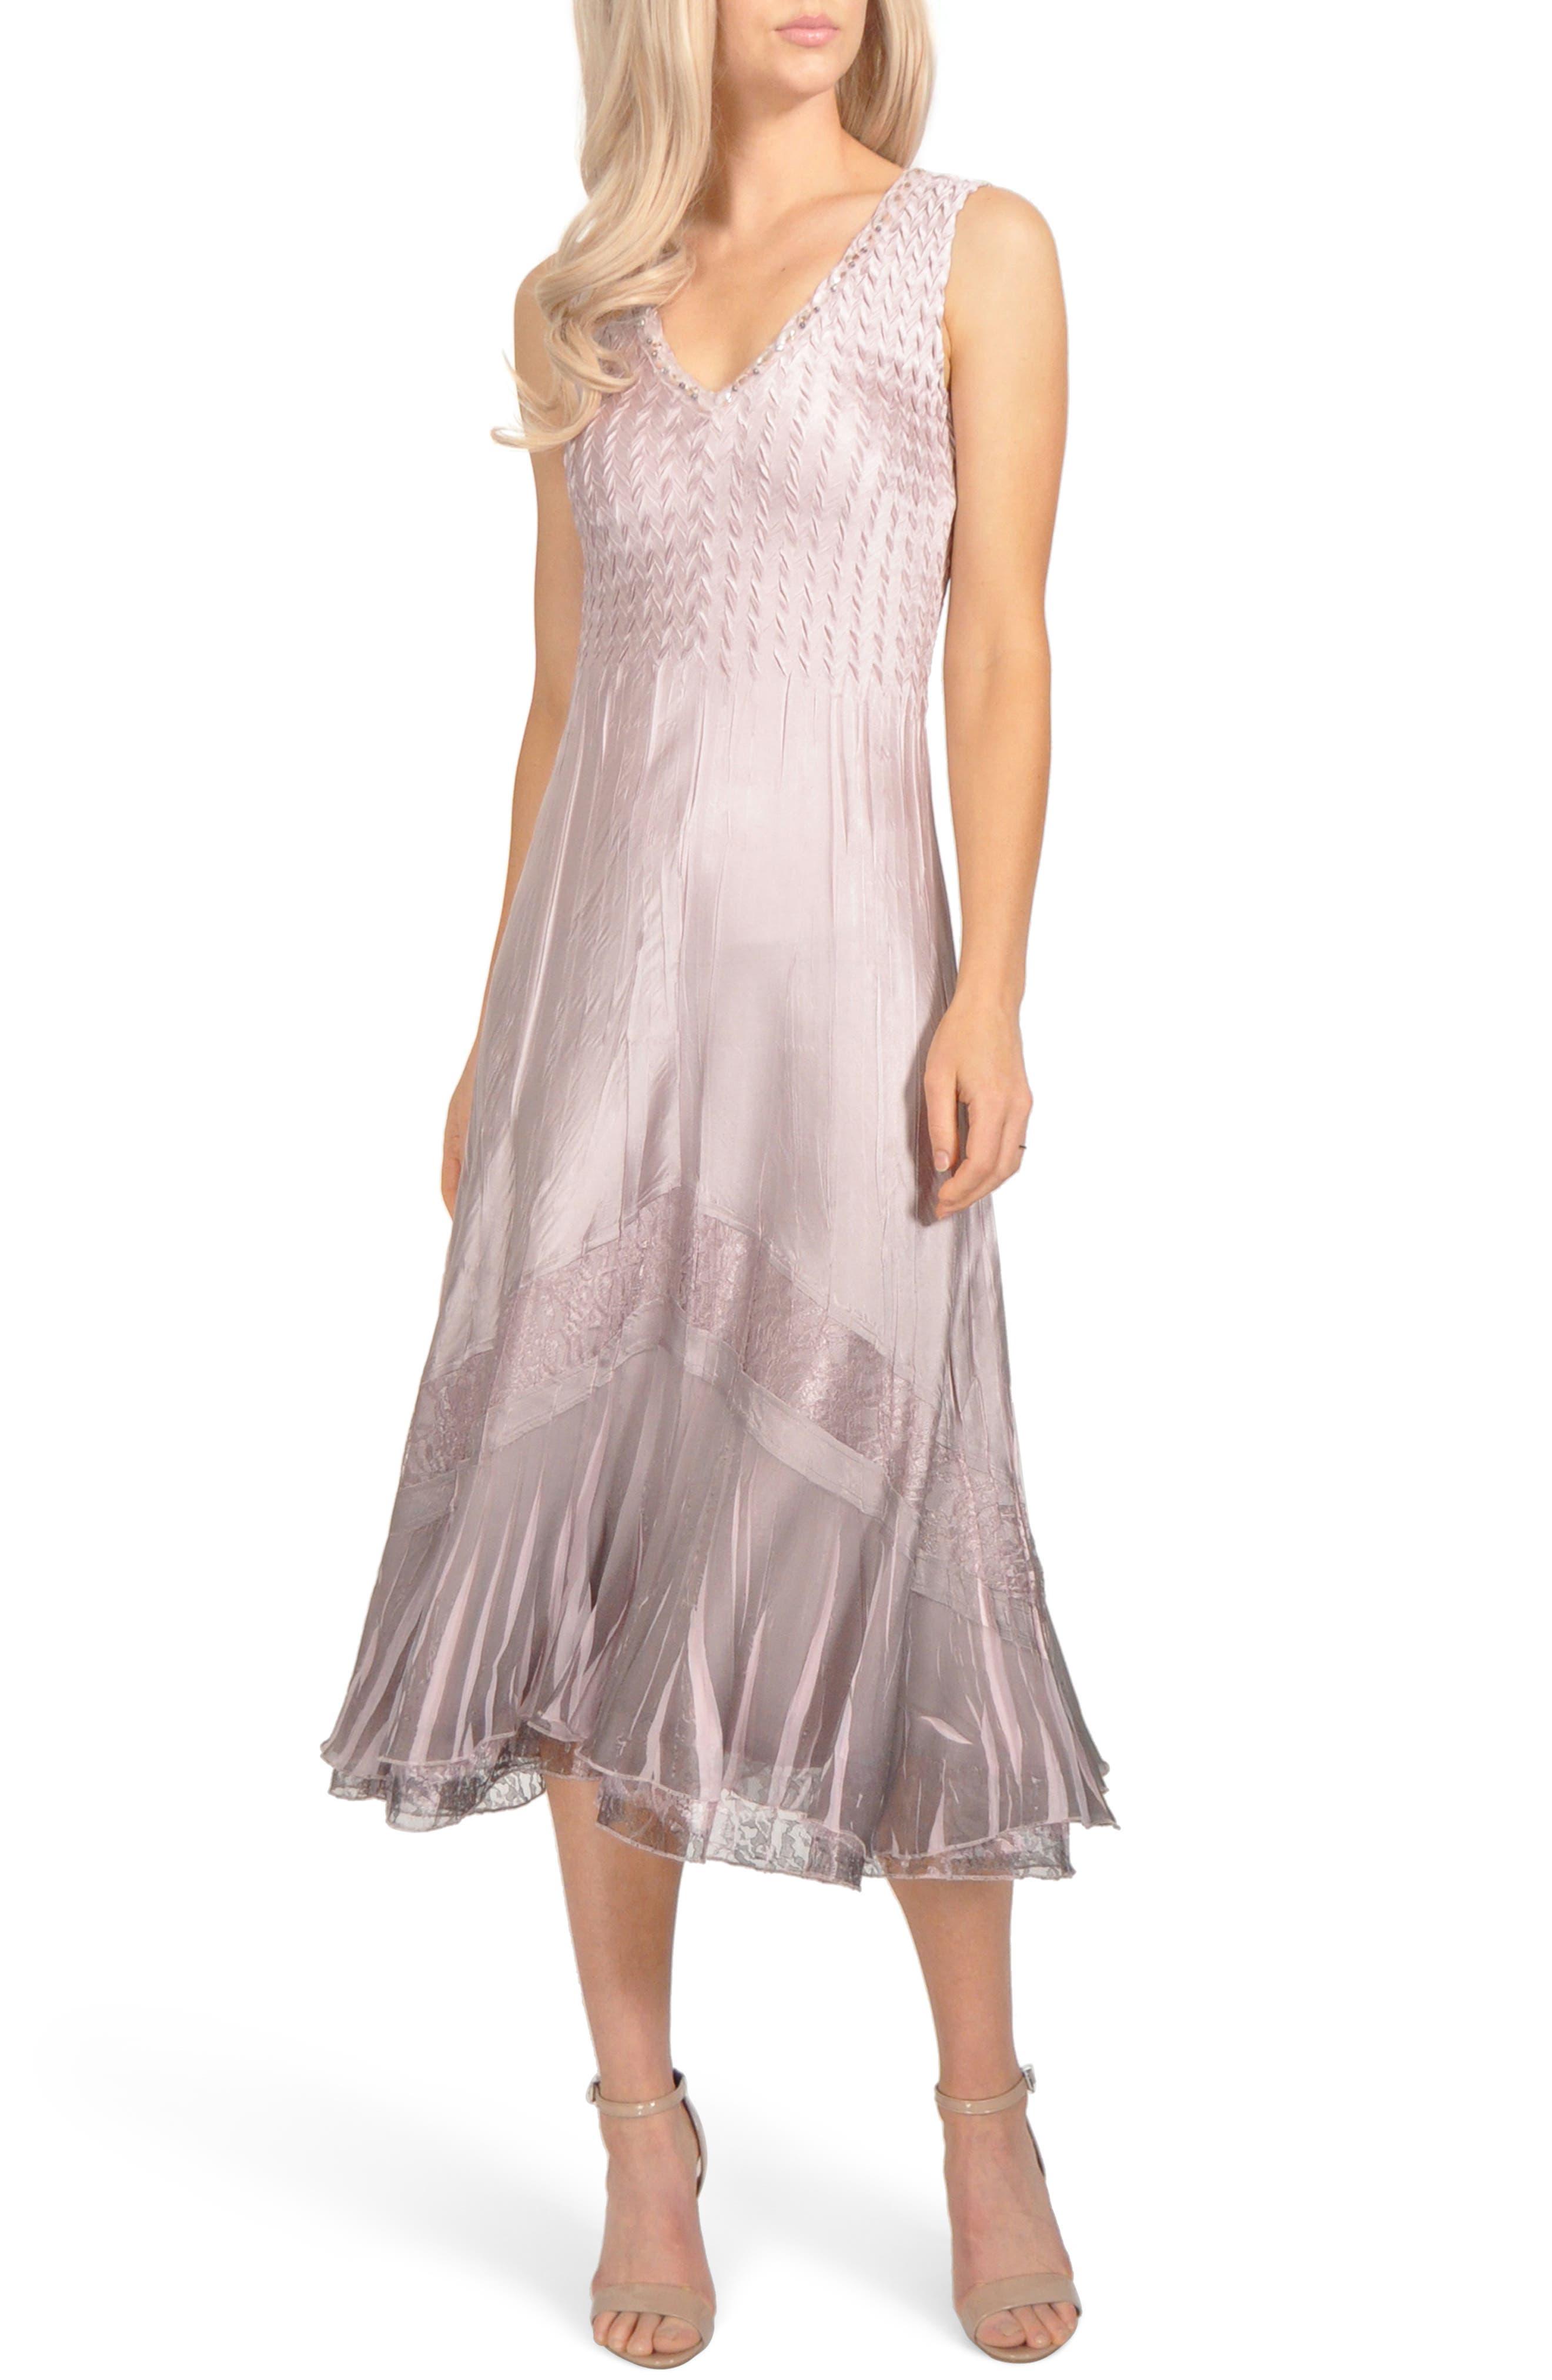 Komarov Lace Inset Charmeuse Dress With Jacket, Pink